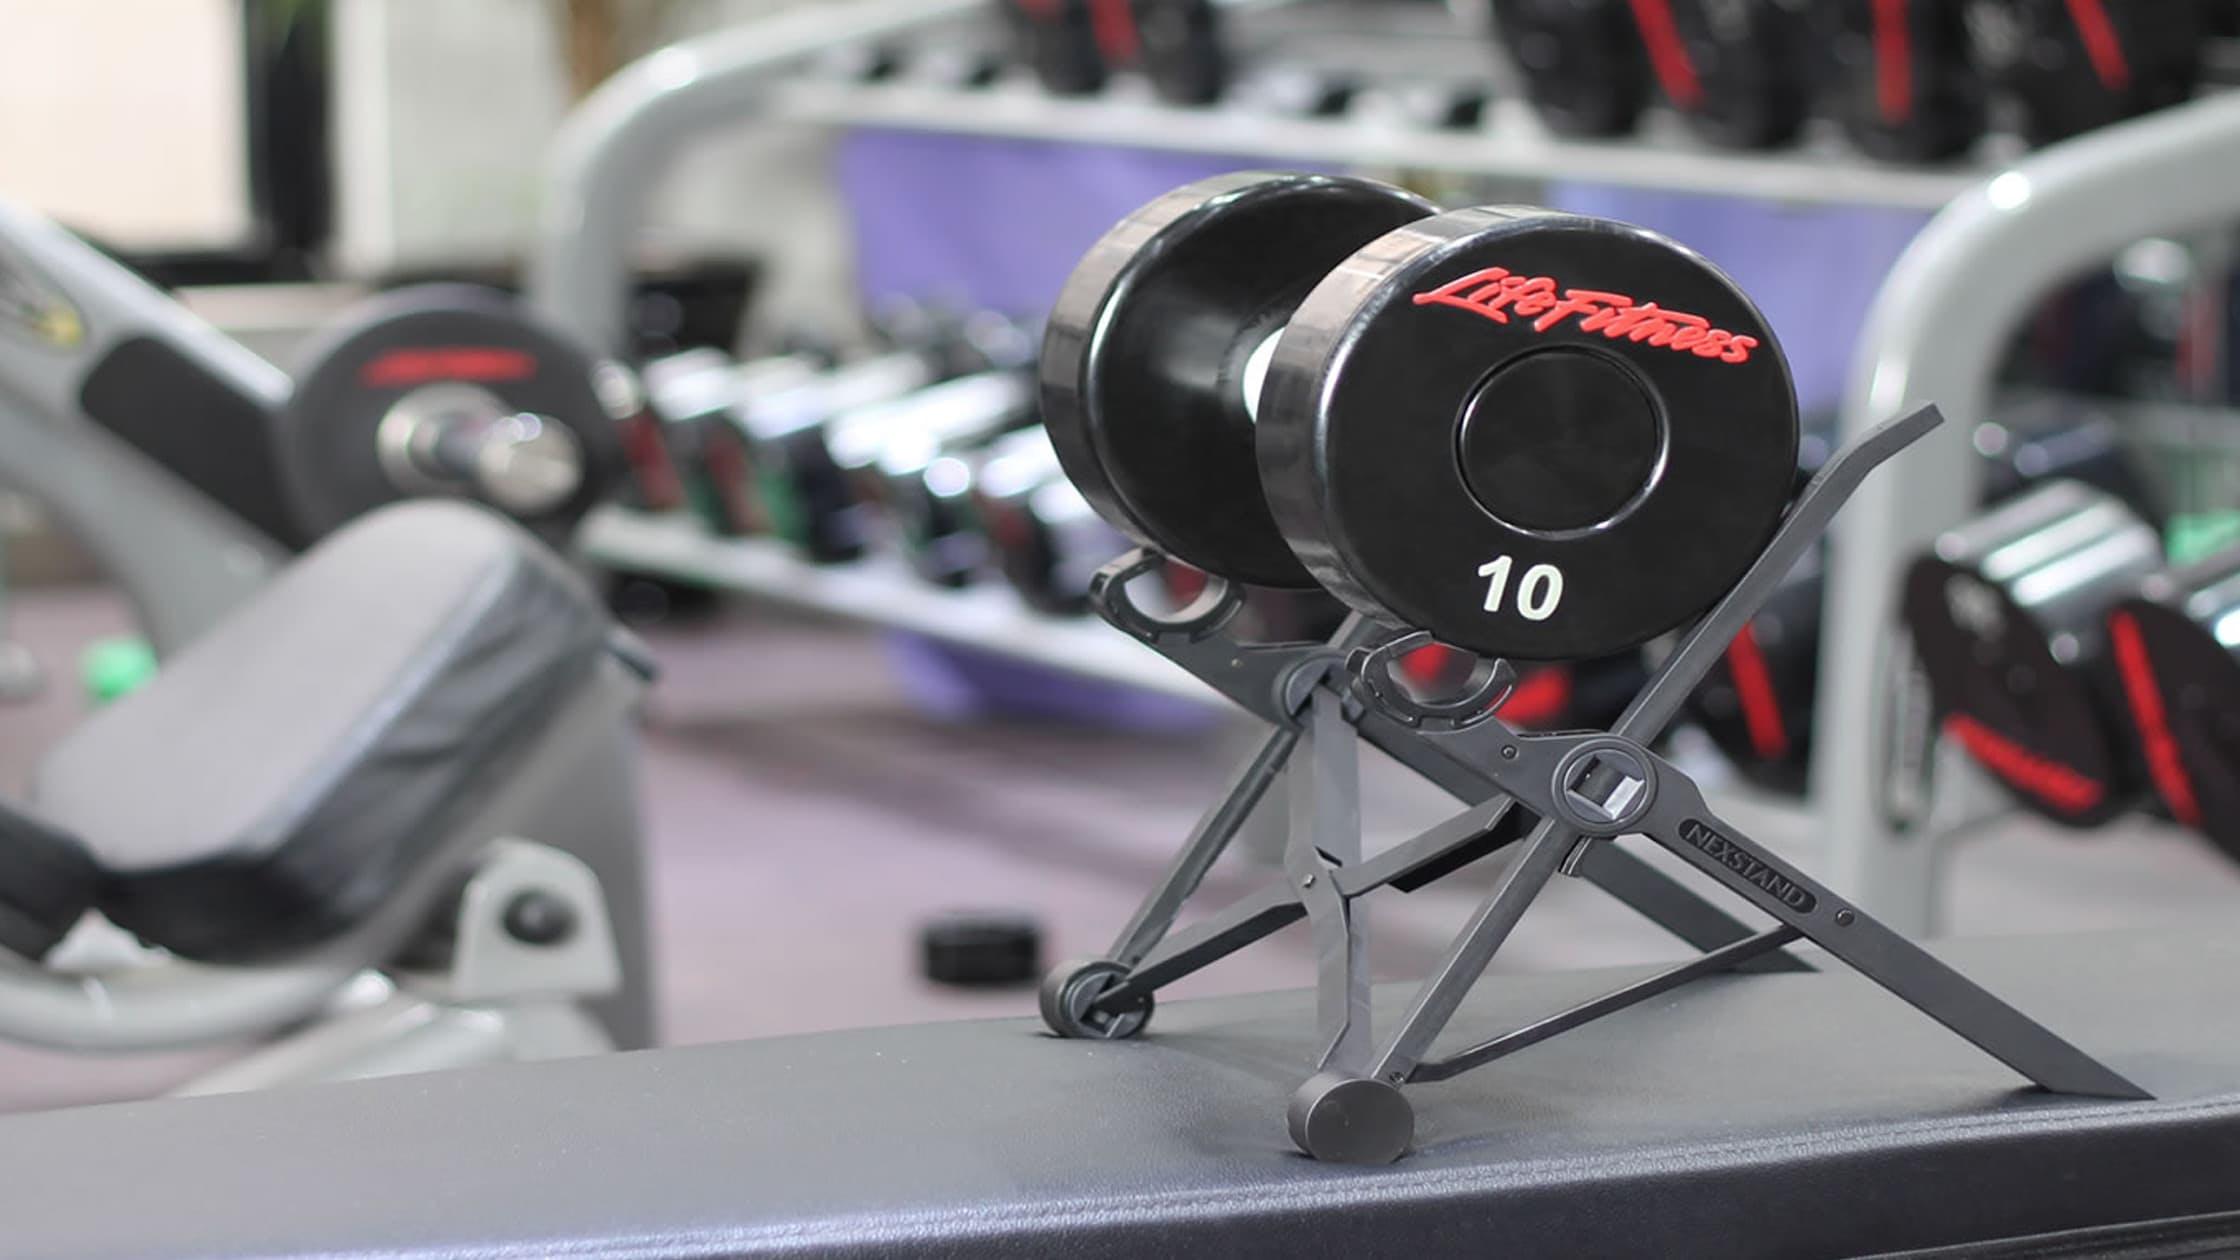 Nextstand Weights Image | Nexstand.com